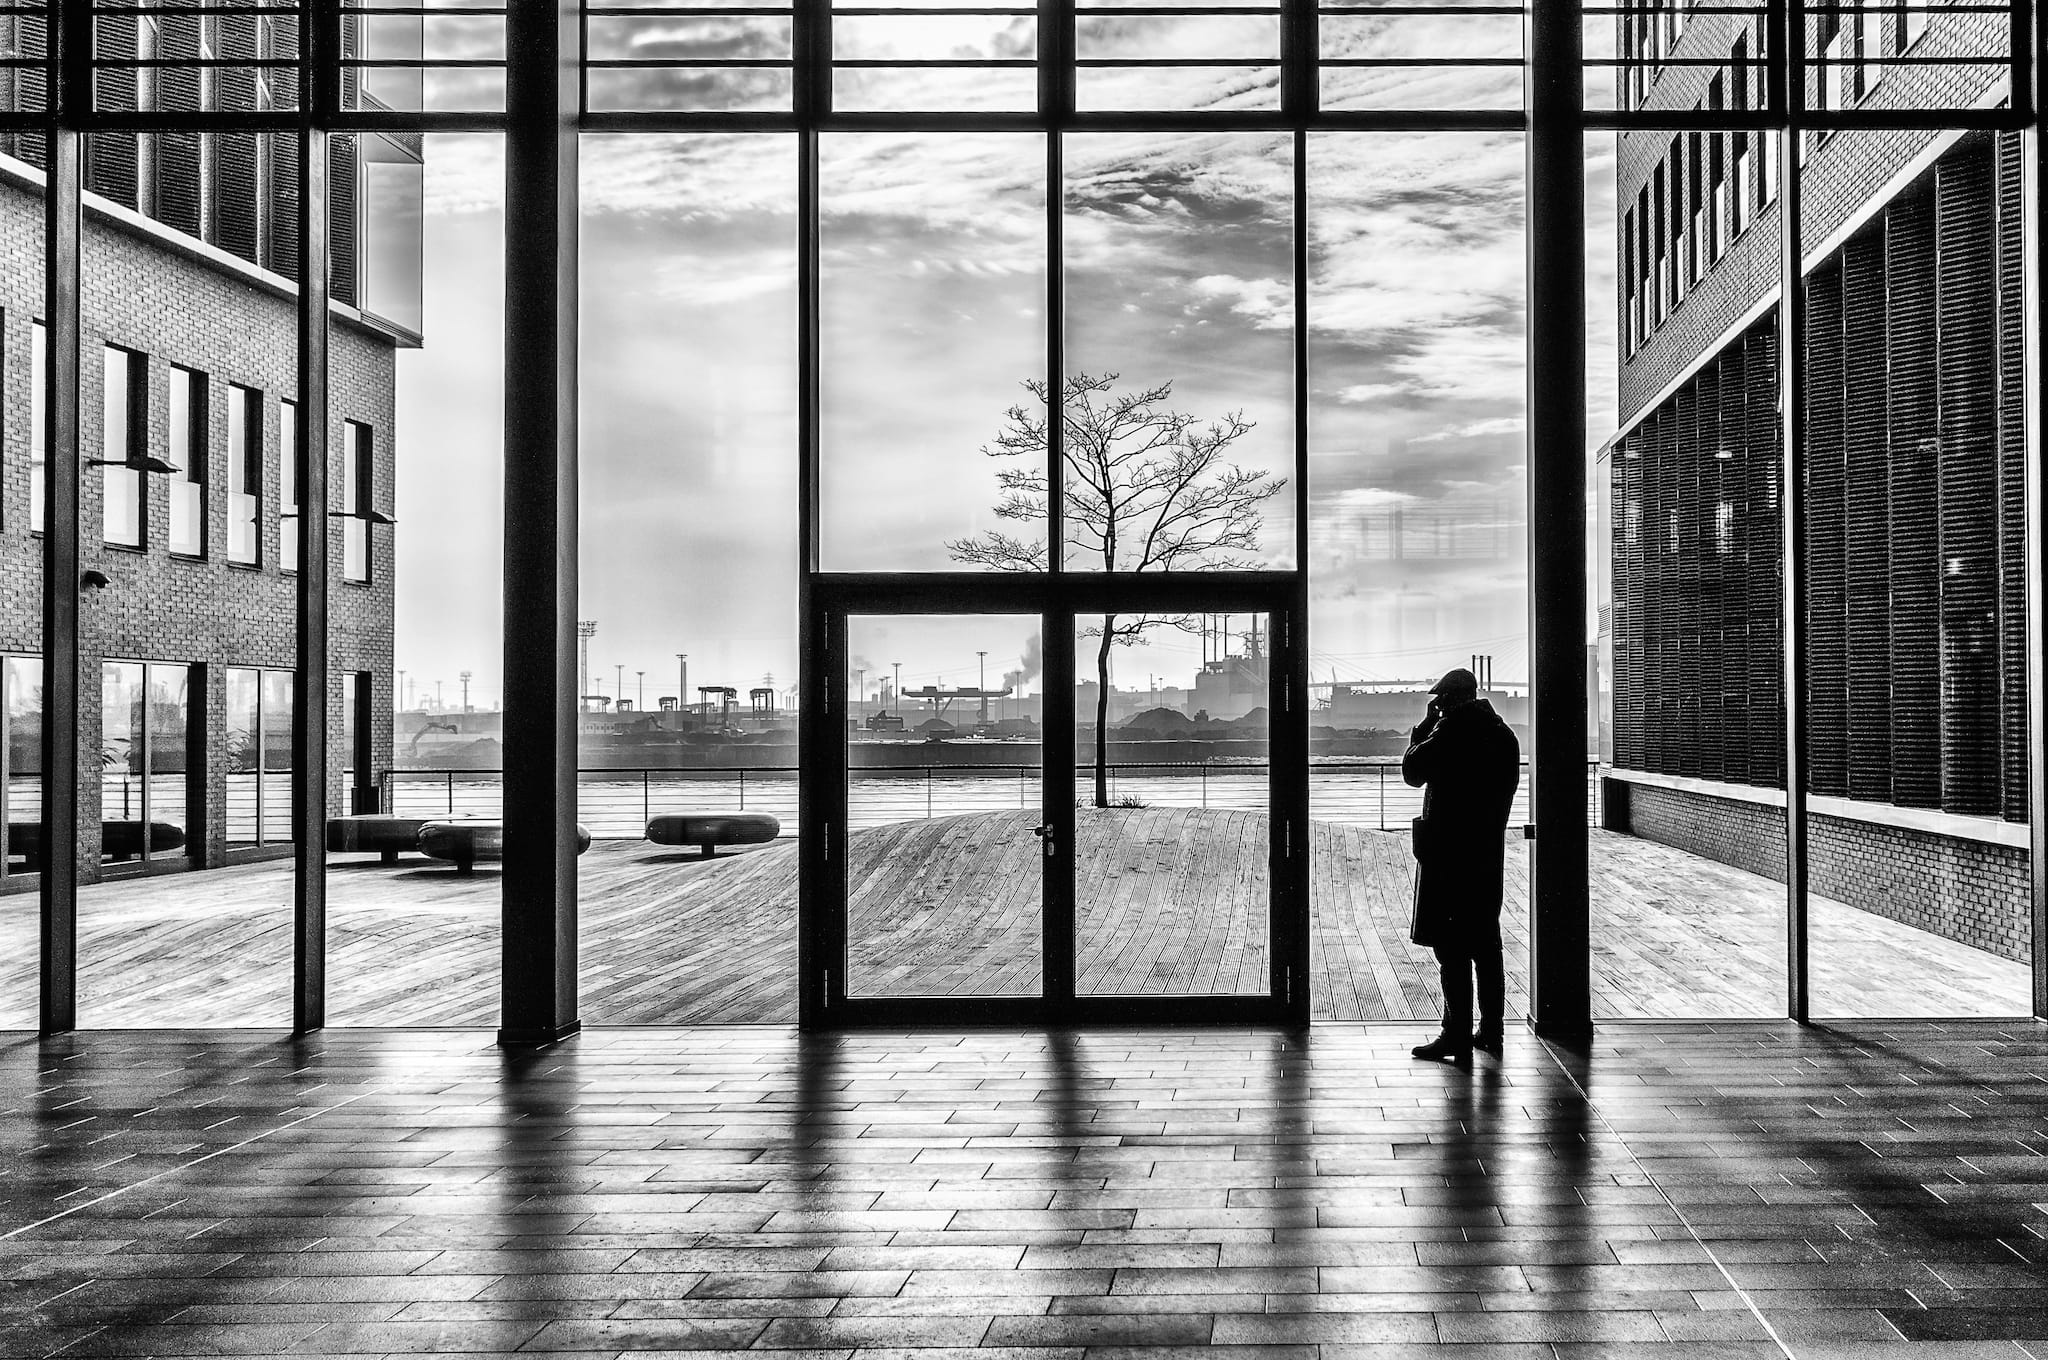 Call with a view by Theodoros Topalis. Große Elbestraße in Hamburg, February 2014